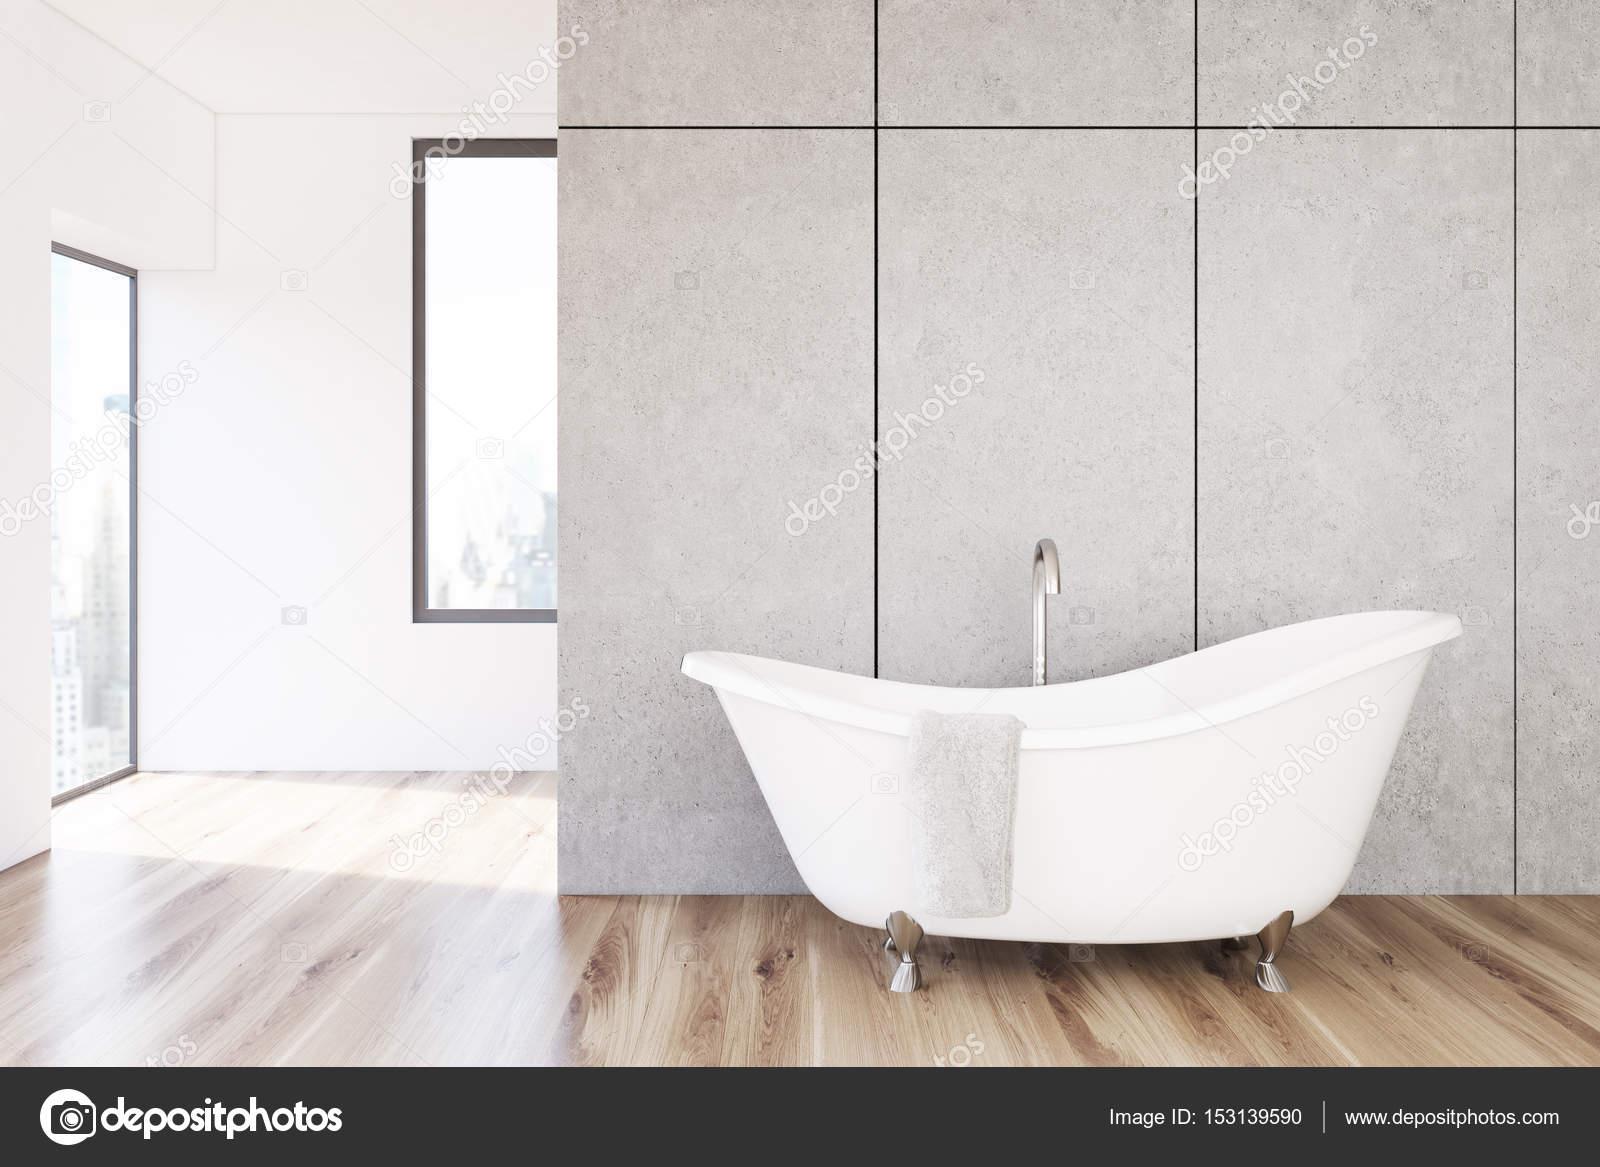 Vasca Da Bagno In Cemento : Vasca da bagno di cemento bianco u2014 foto stock © denisismagilov